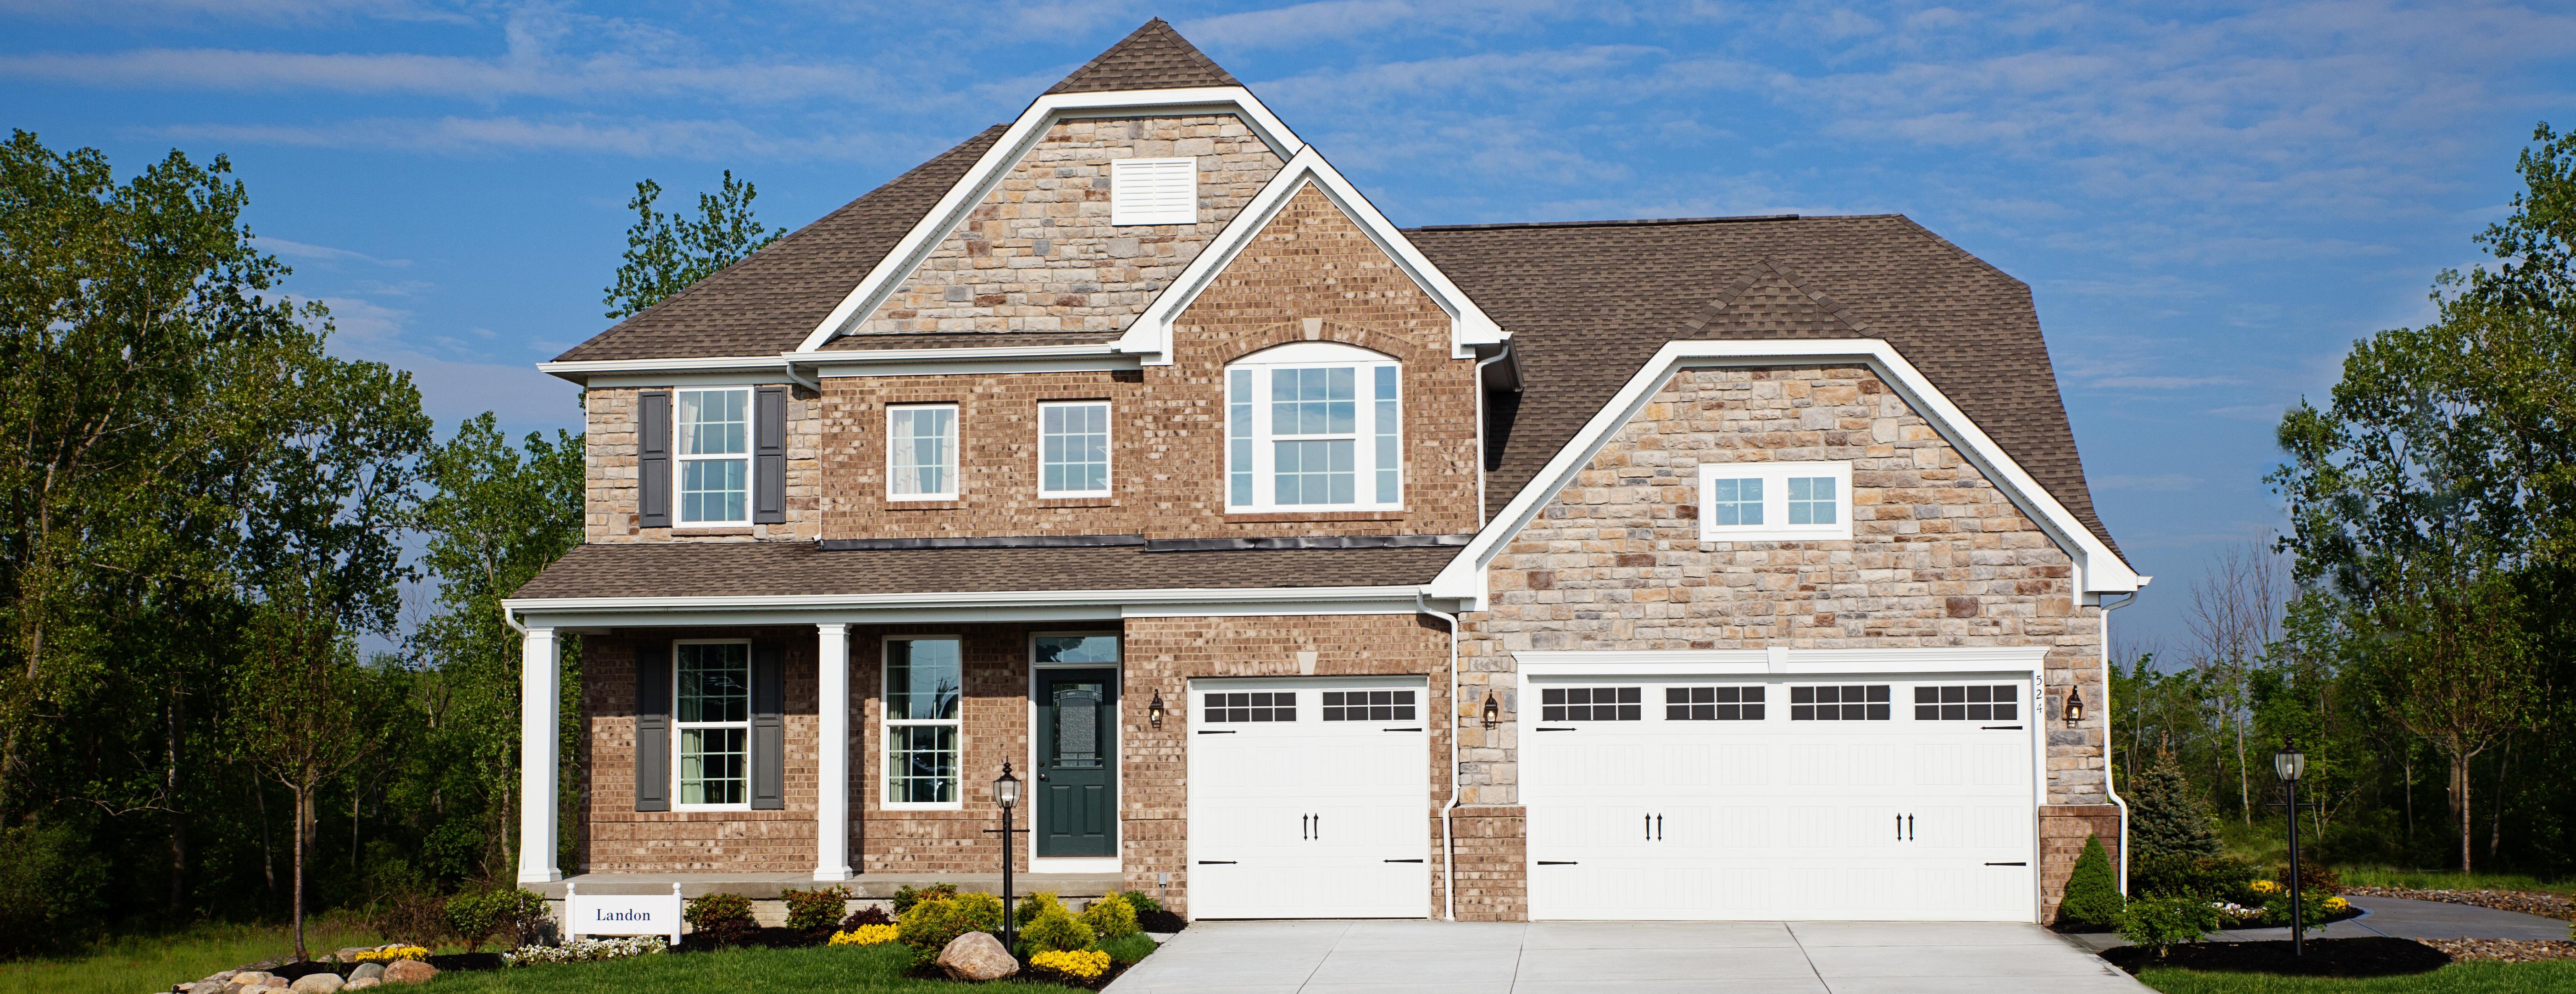 Ryan Homes For Sale Cincinnati Ohio